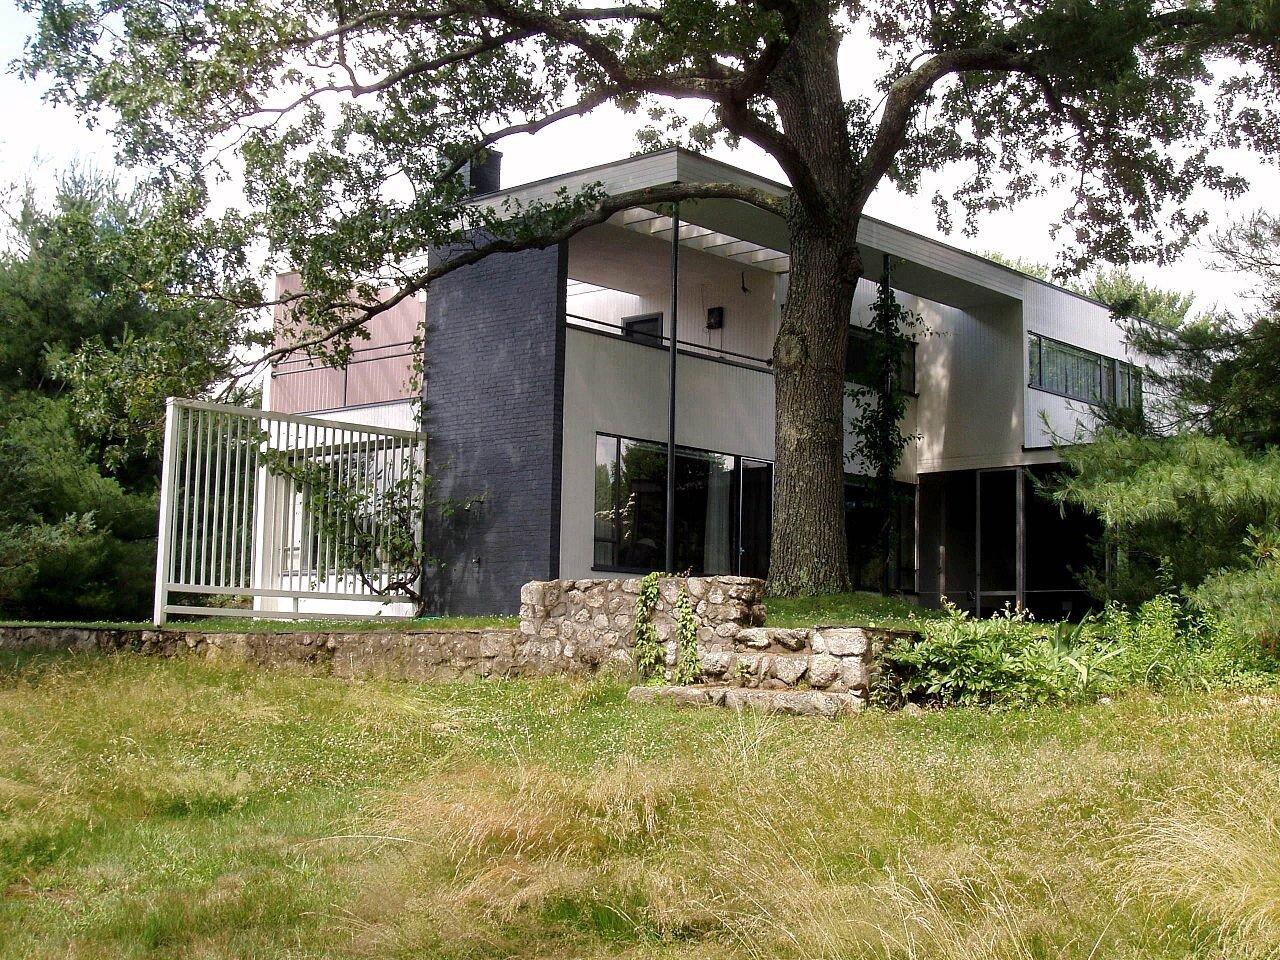 Gropius House, Lincoln Massachusetts | photo courtesy of Daderot and Wikimedia Commons